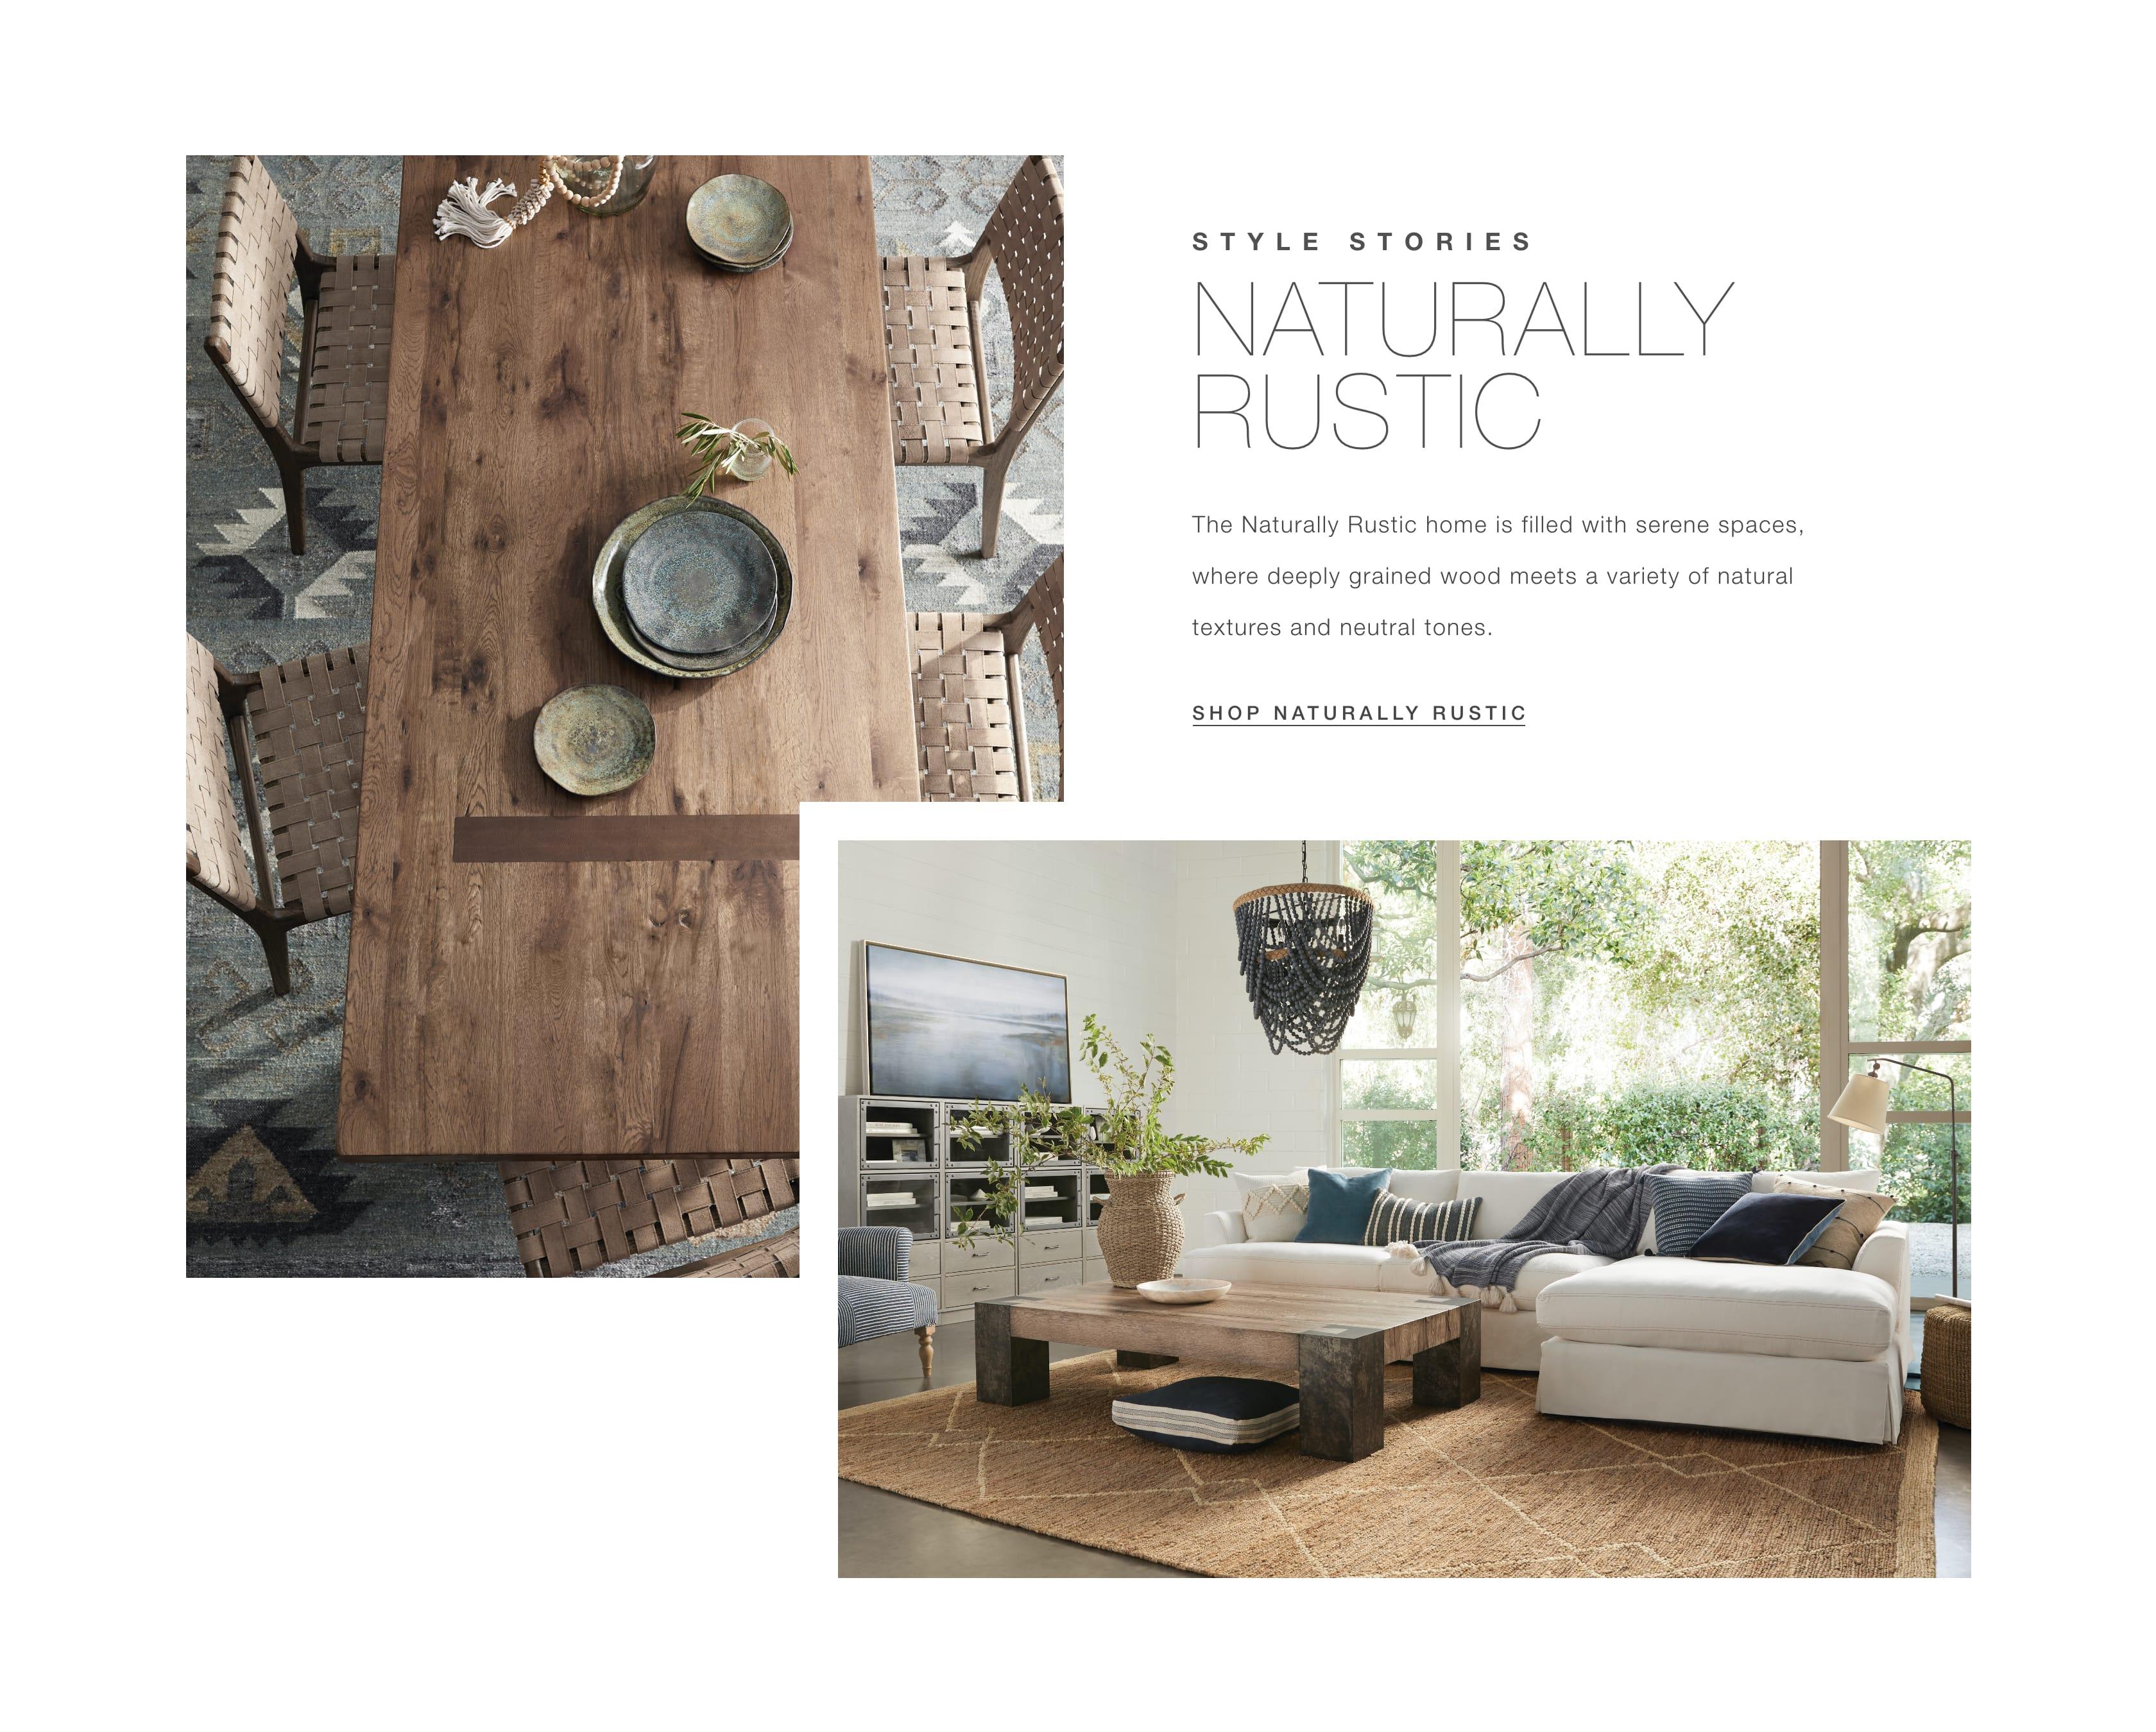 Shop Naturally Rustic